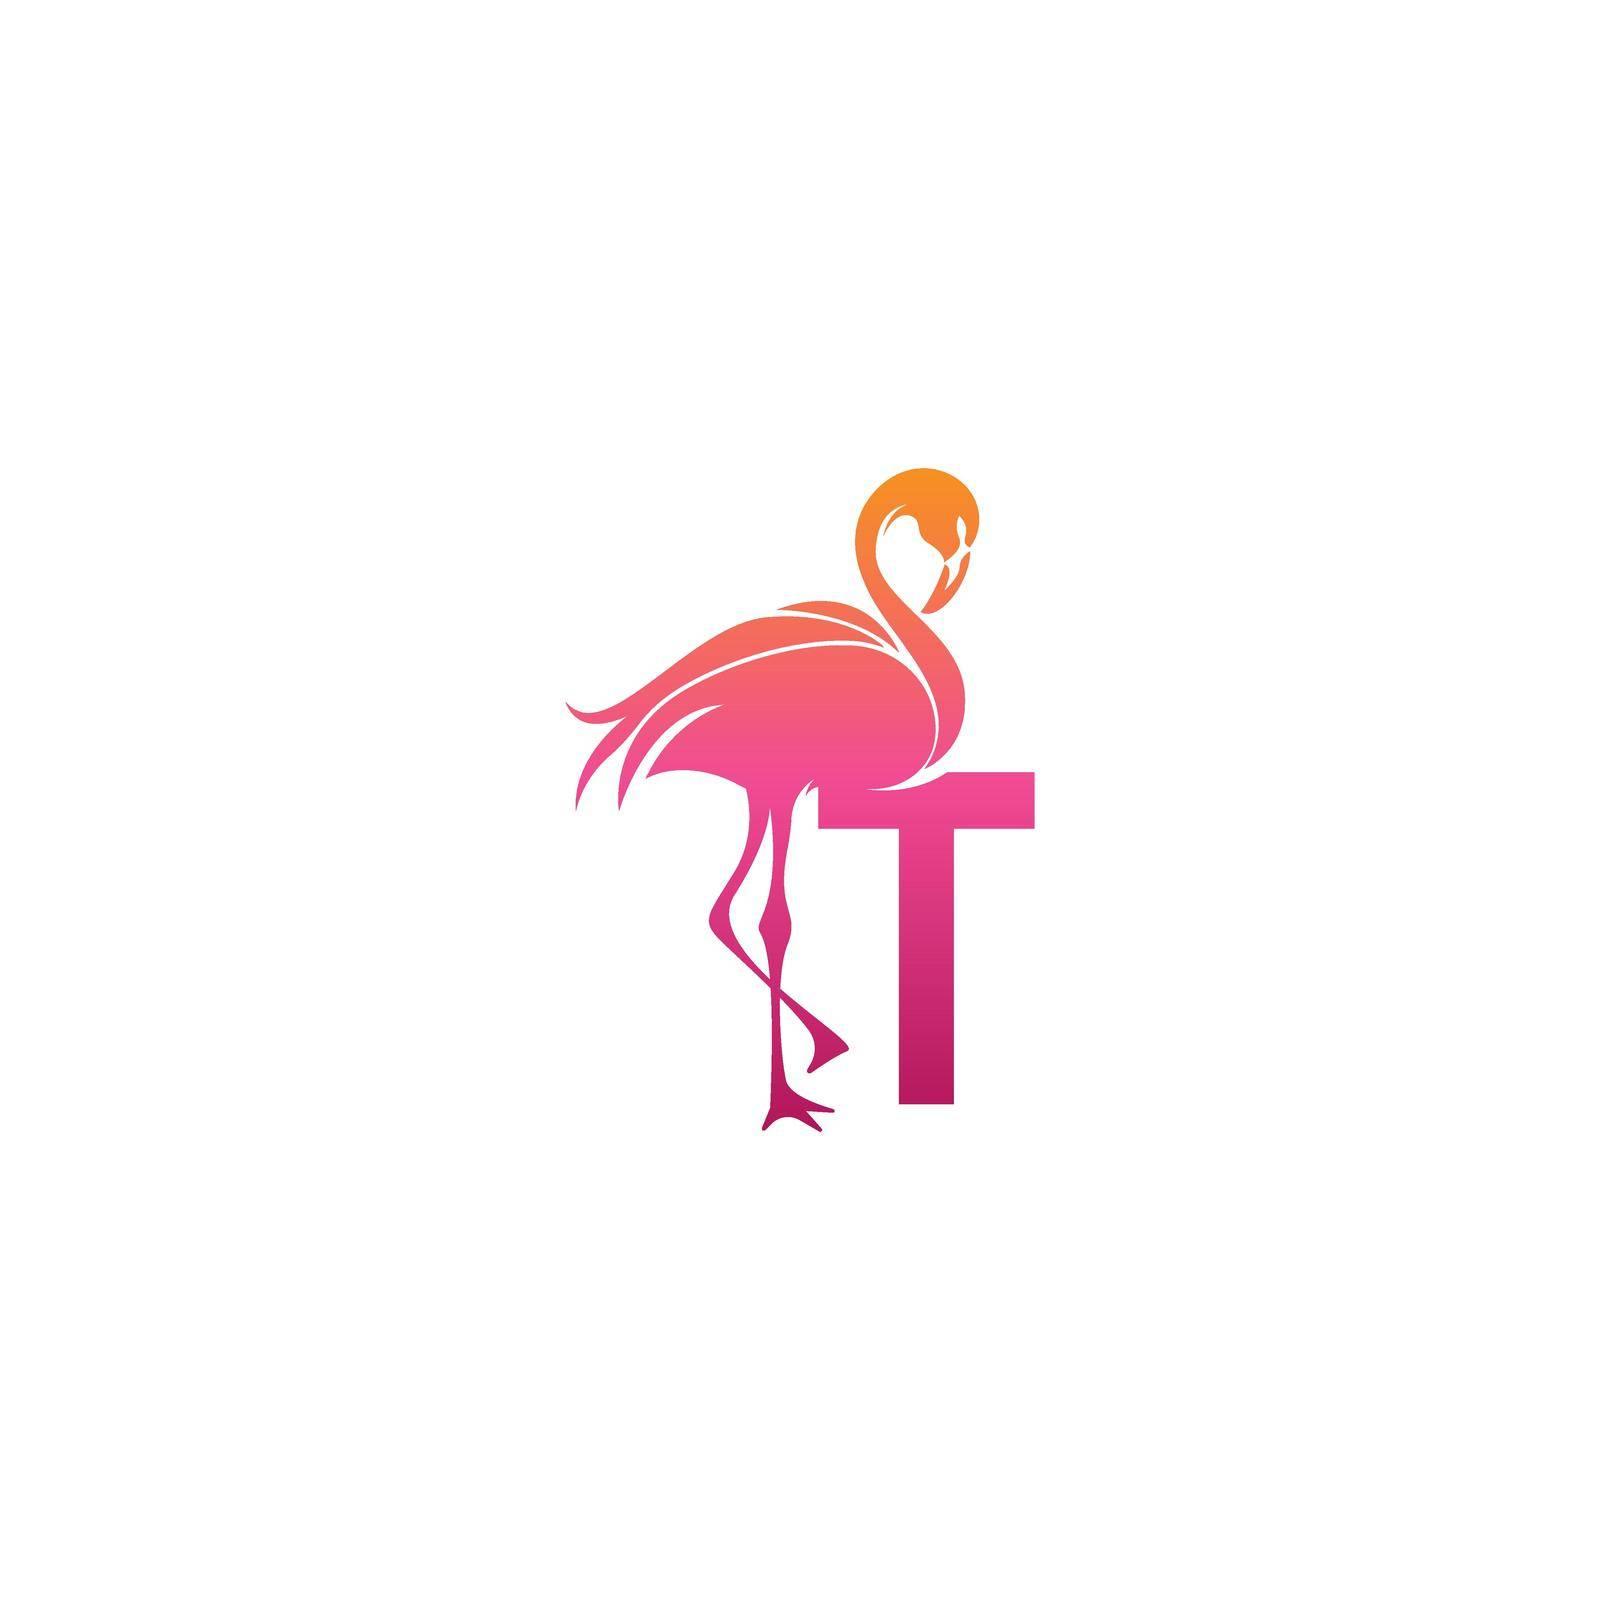 Flamingo bird icon with letter T Logo design vector template